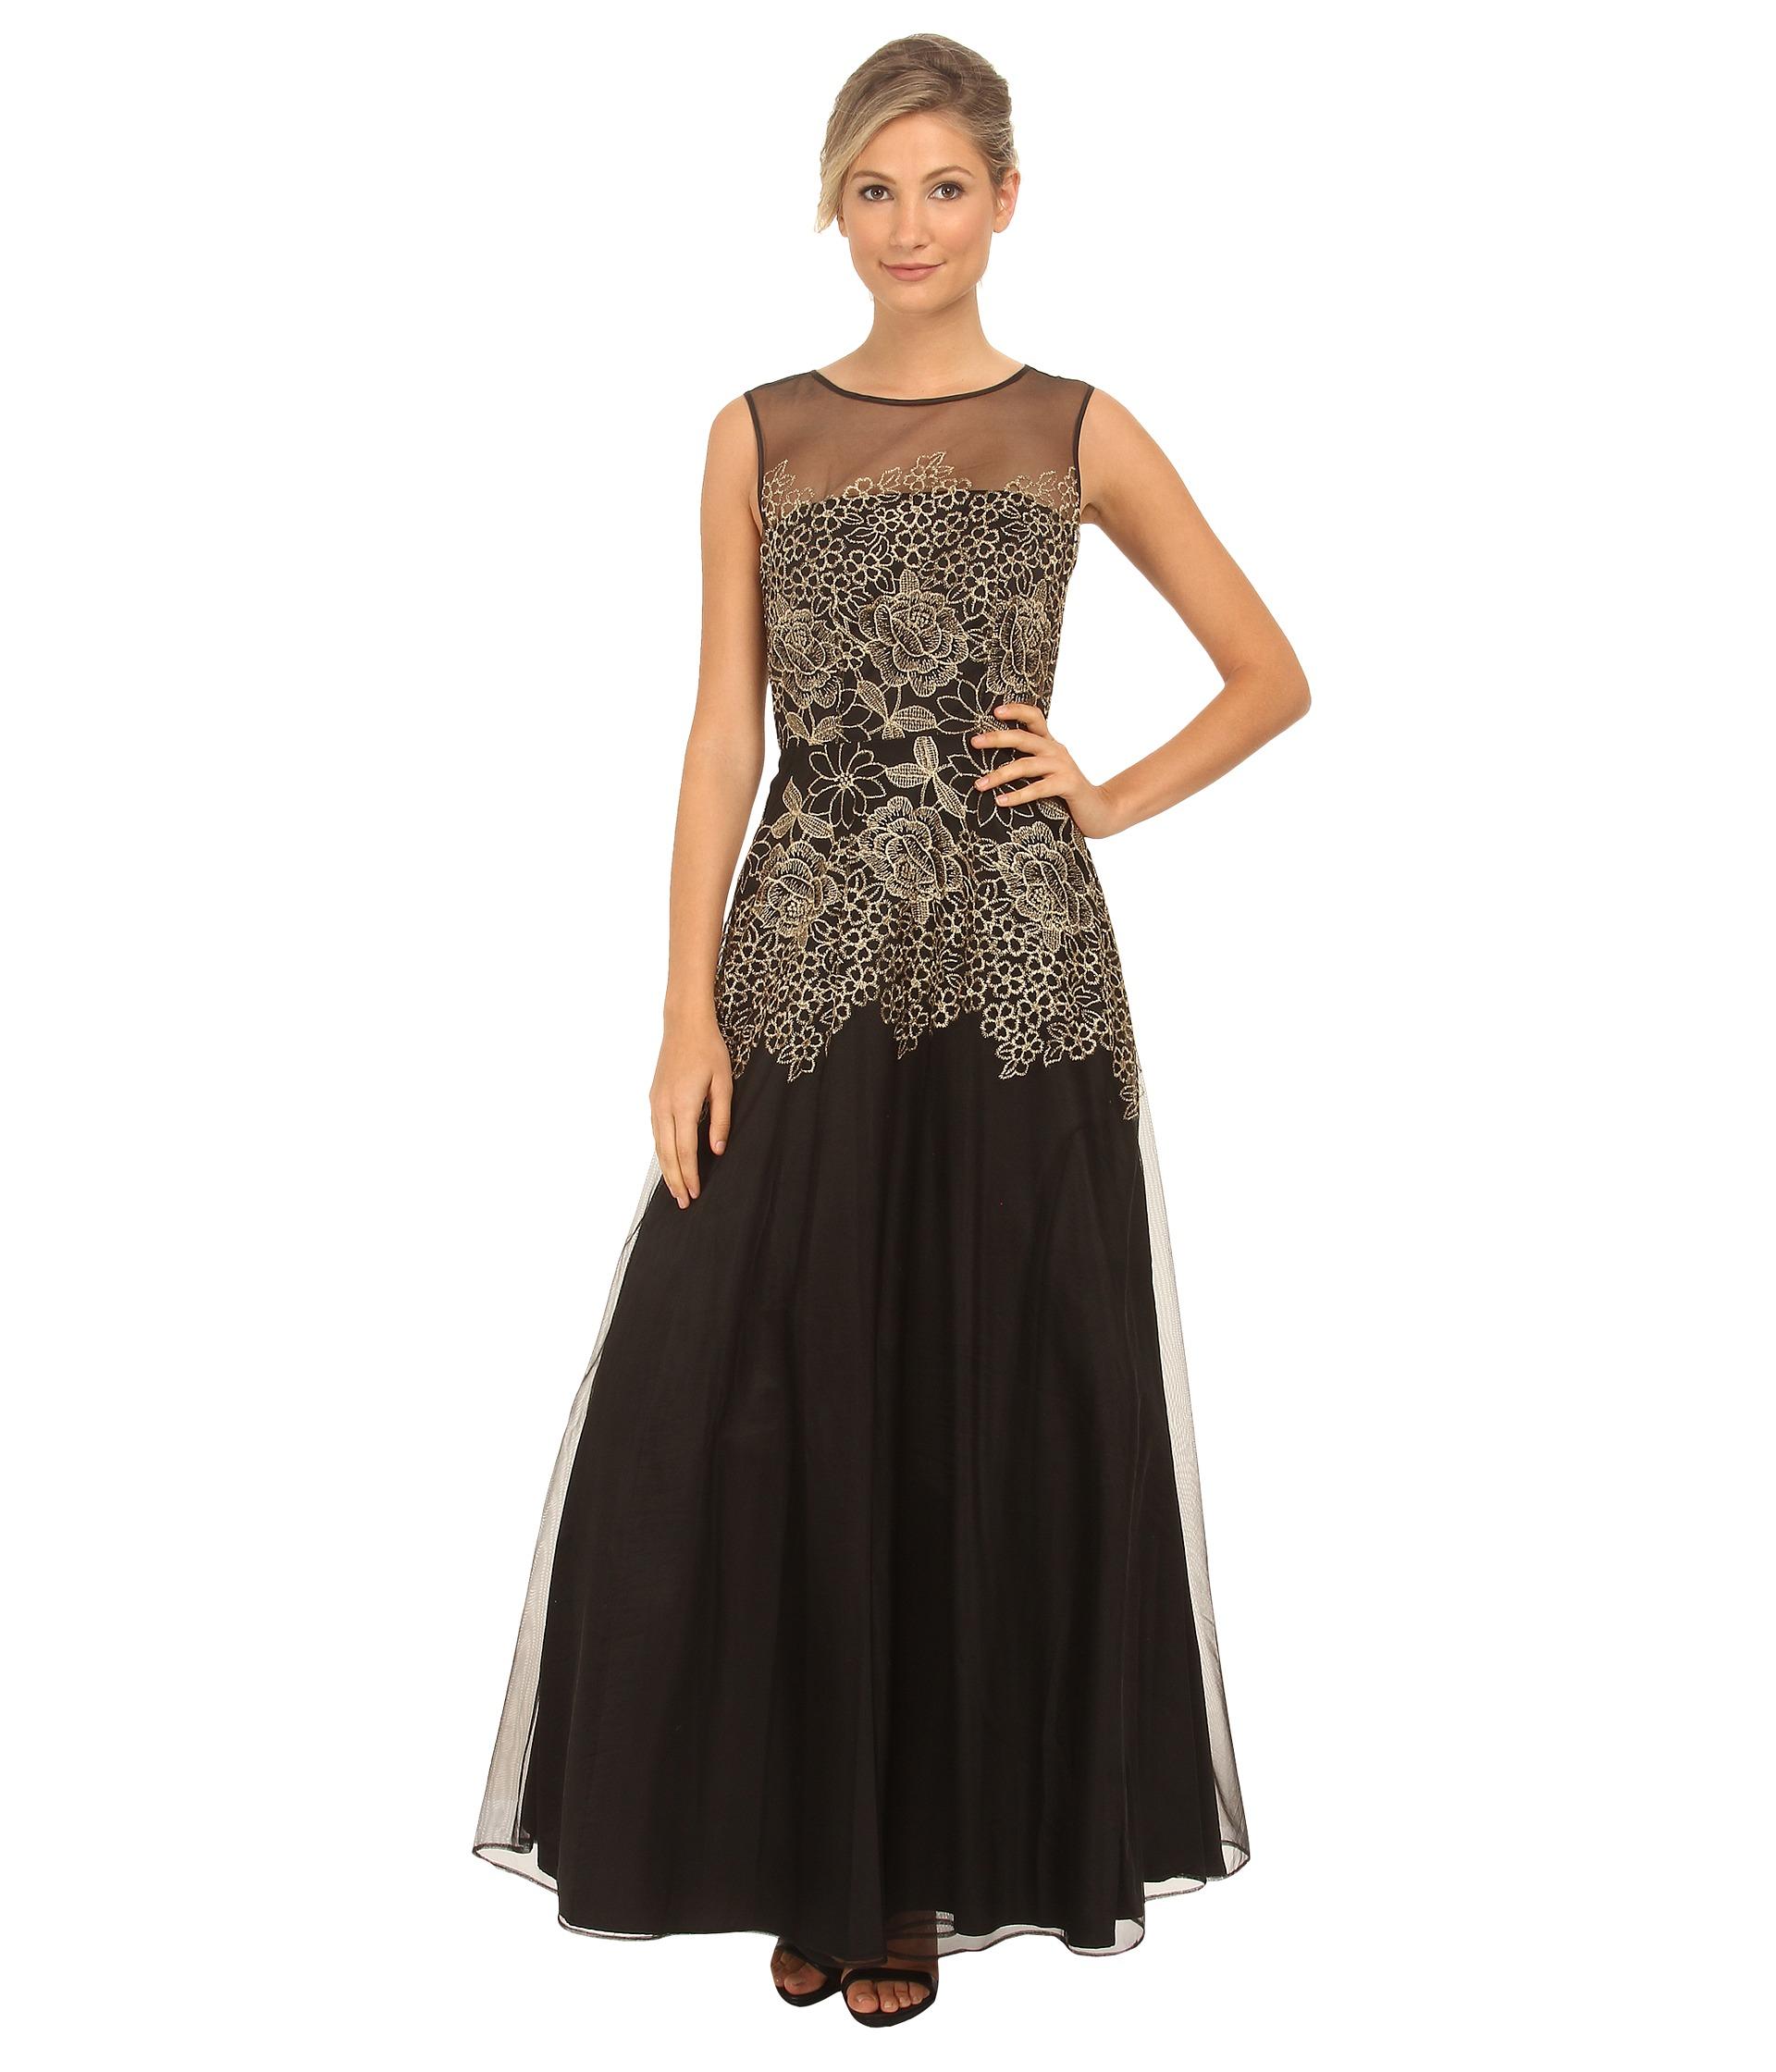 Tahari dresses black and white lace